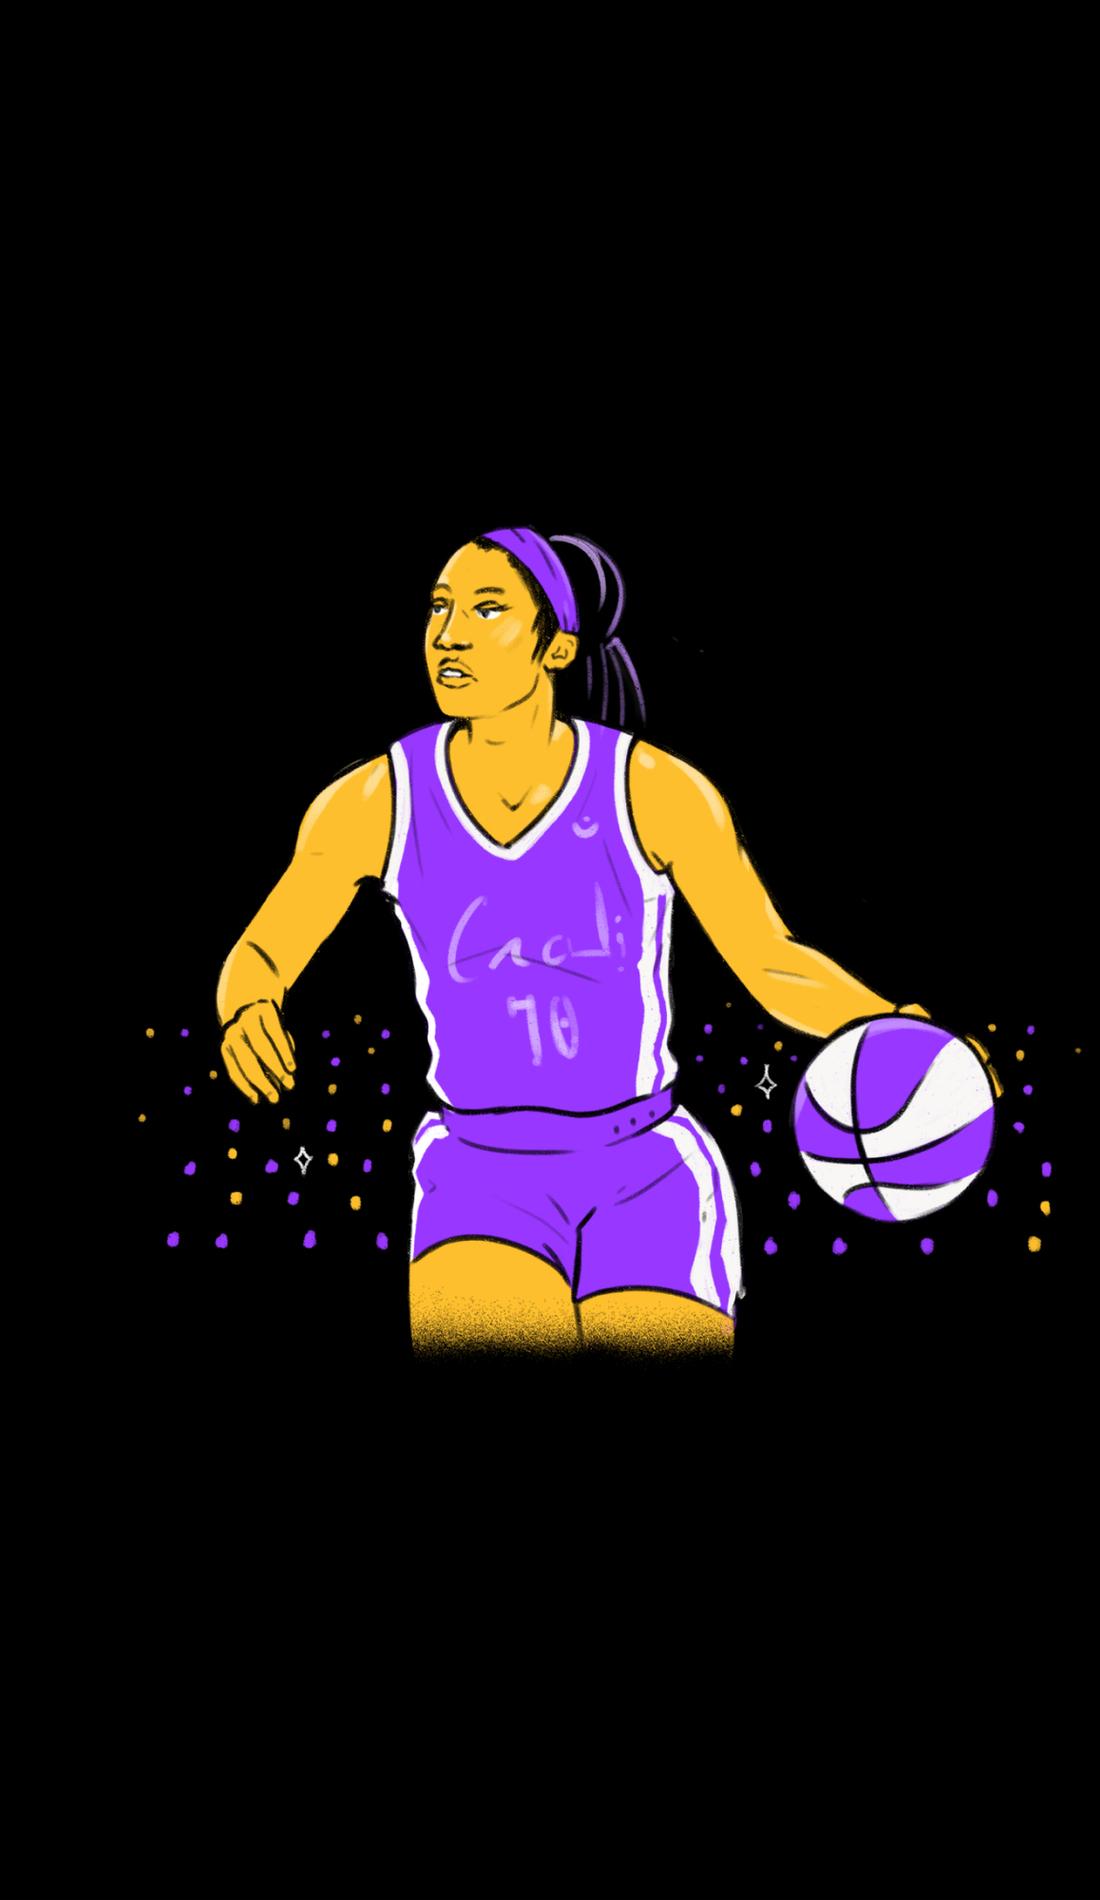 A Maryland Terrapins Womens Basketball live event